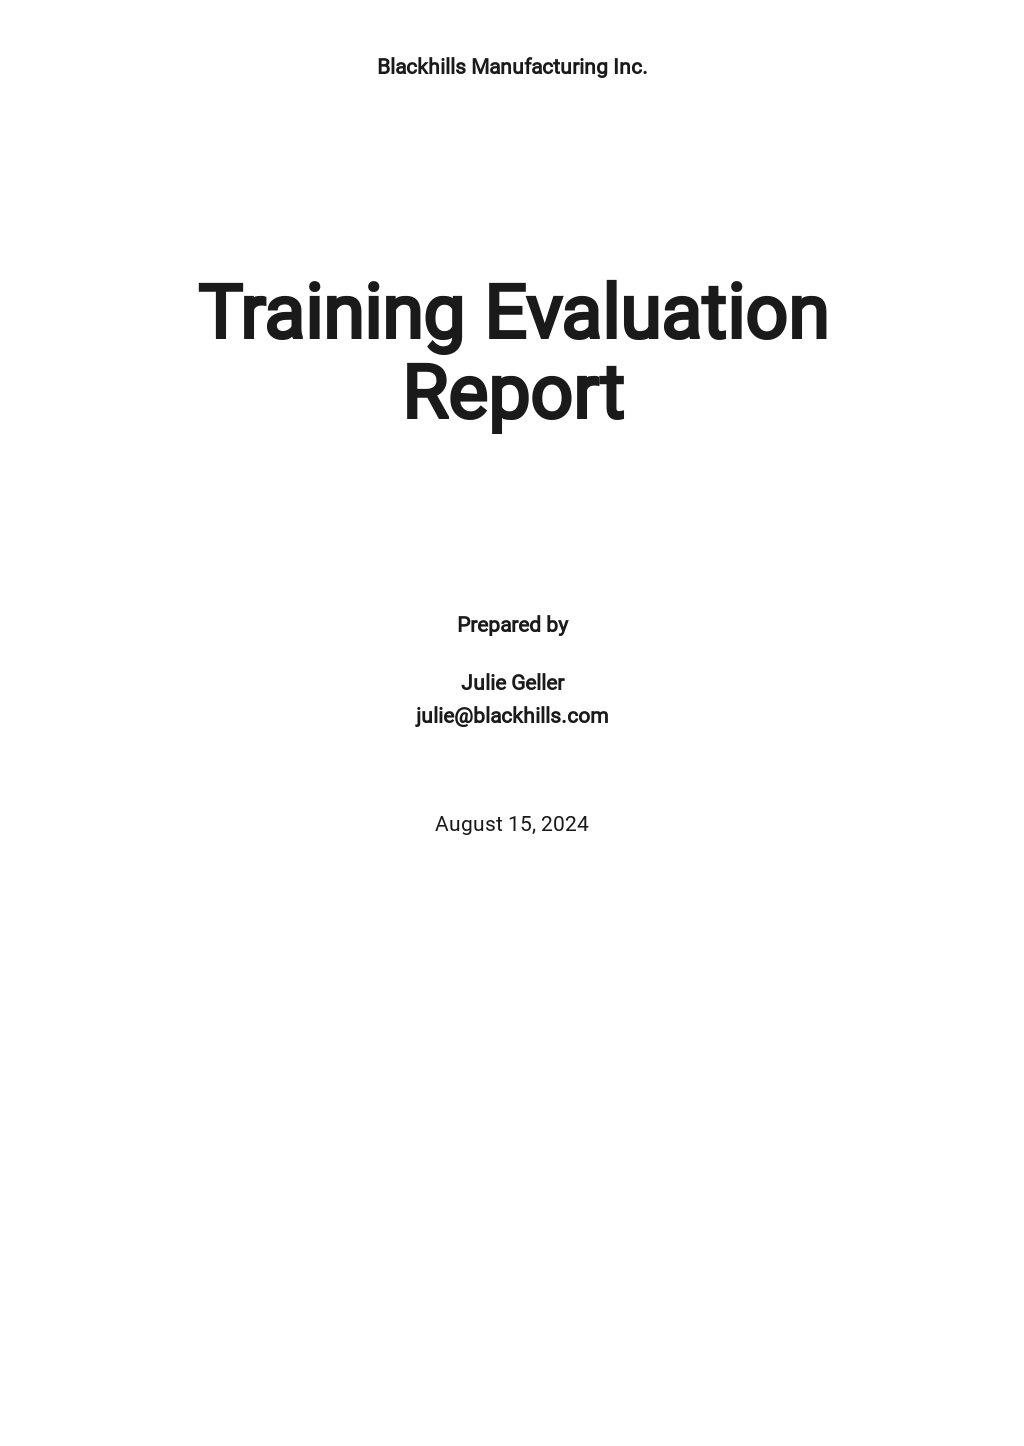 Evaluation Report Template .jpe